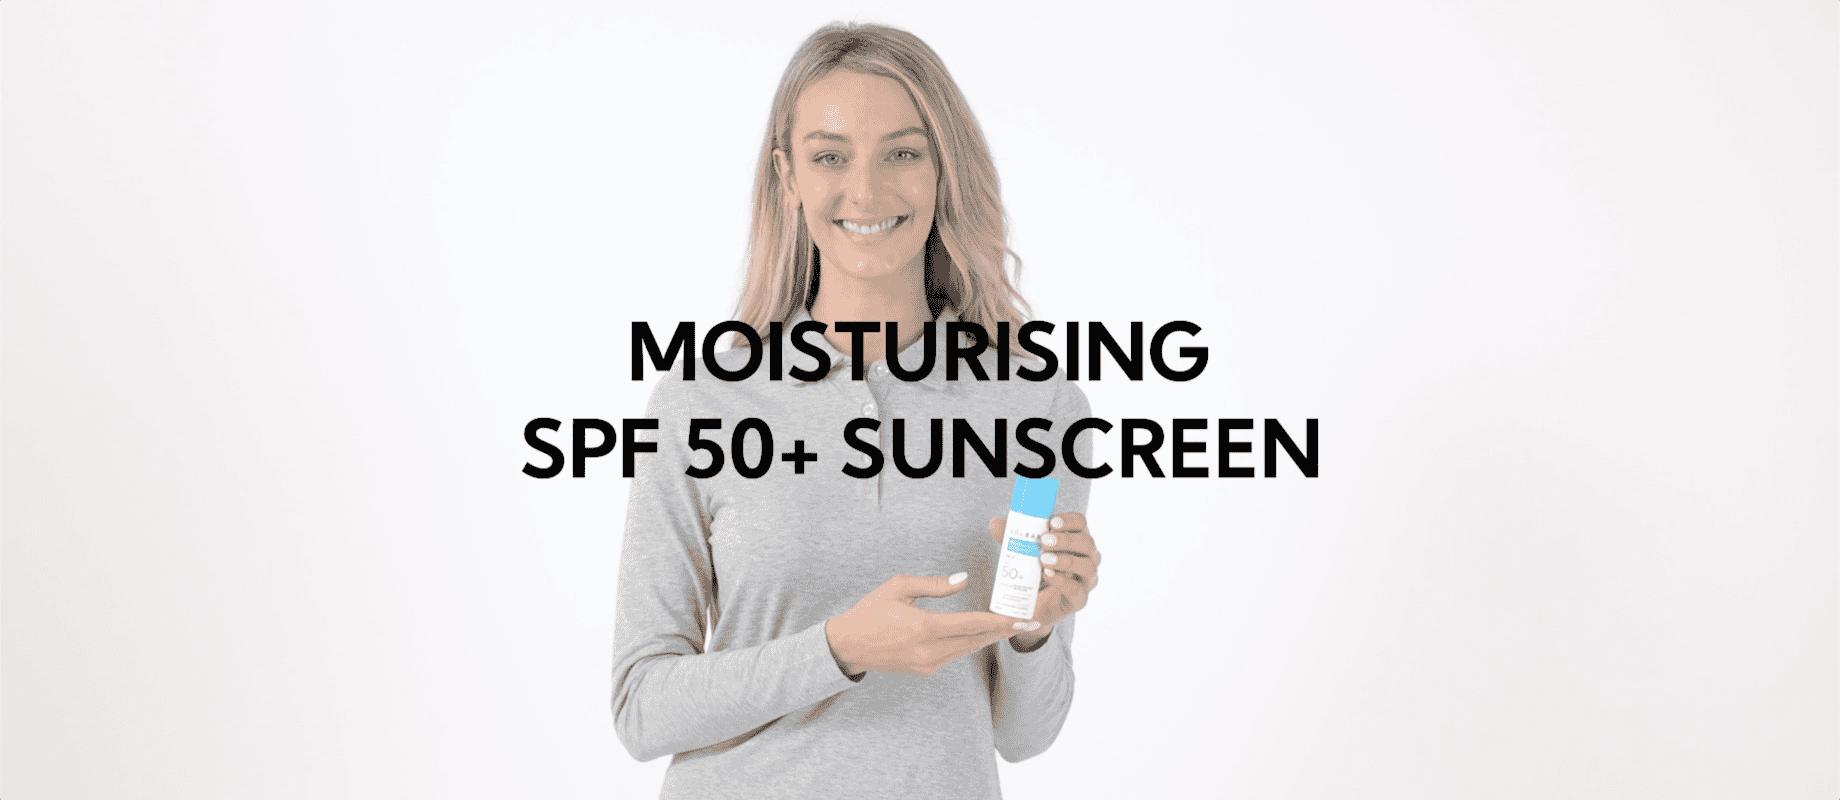 Moisturizing SPF50+ Face Sunscreen, 50ml / 1.7oz